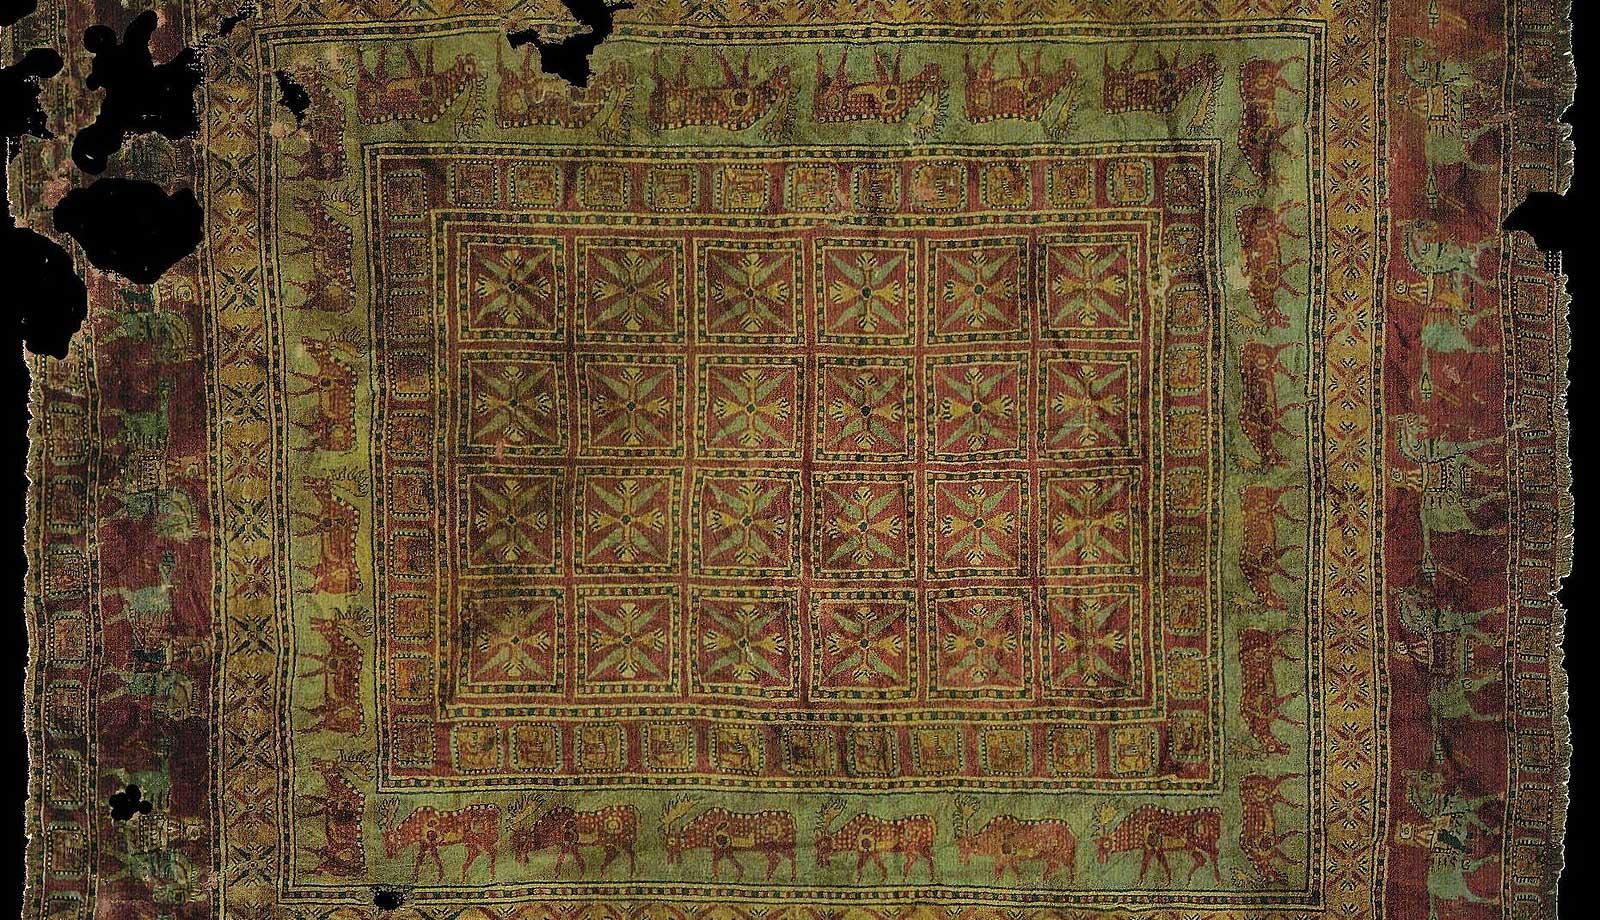 The Pazyryk Carpet